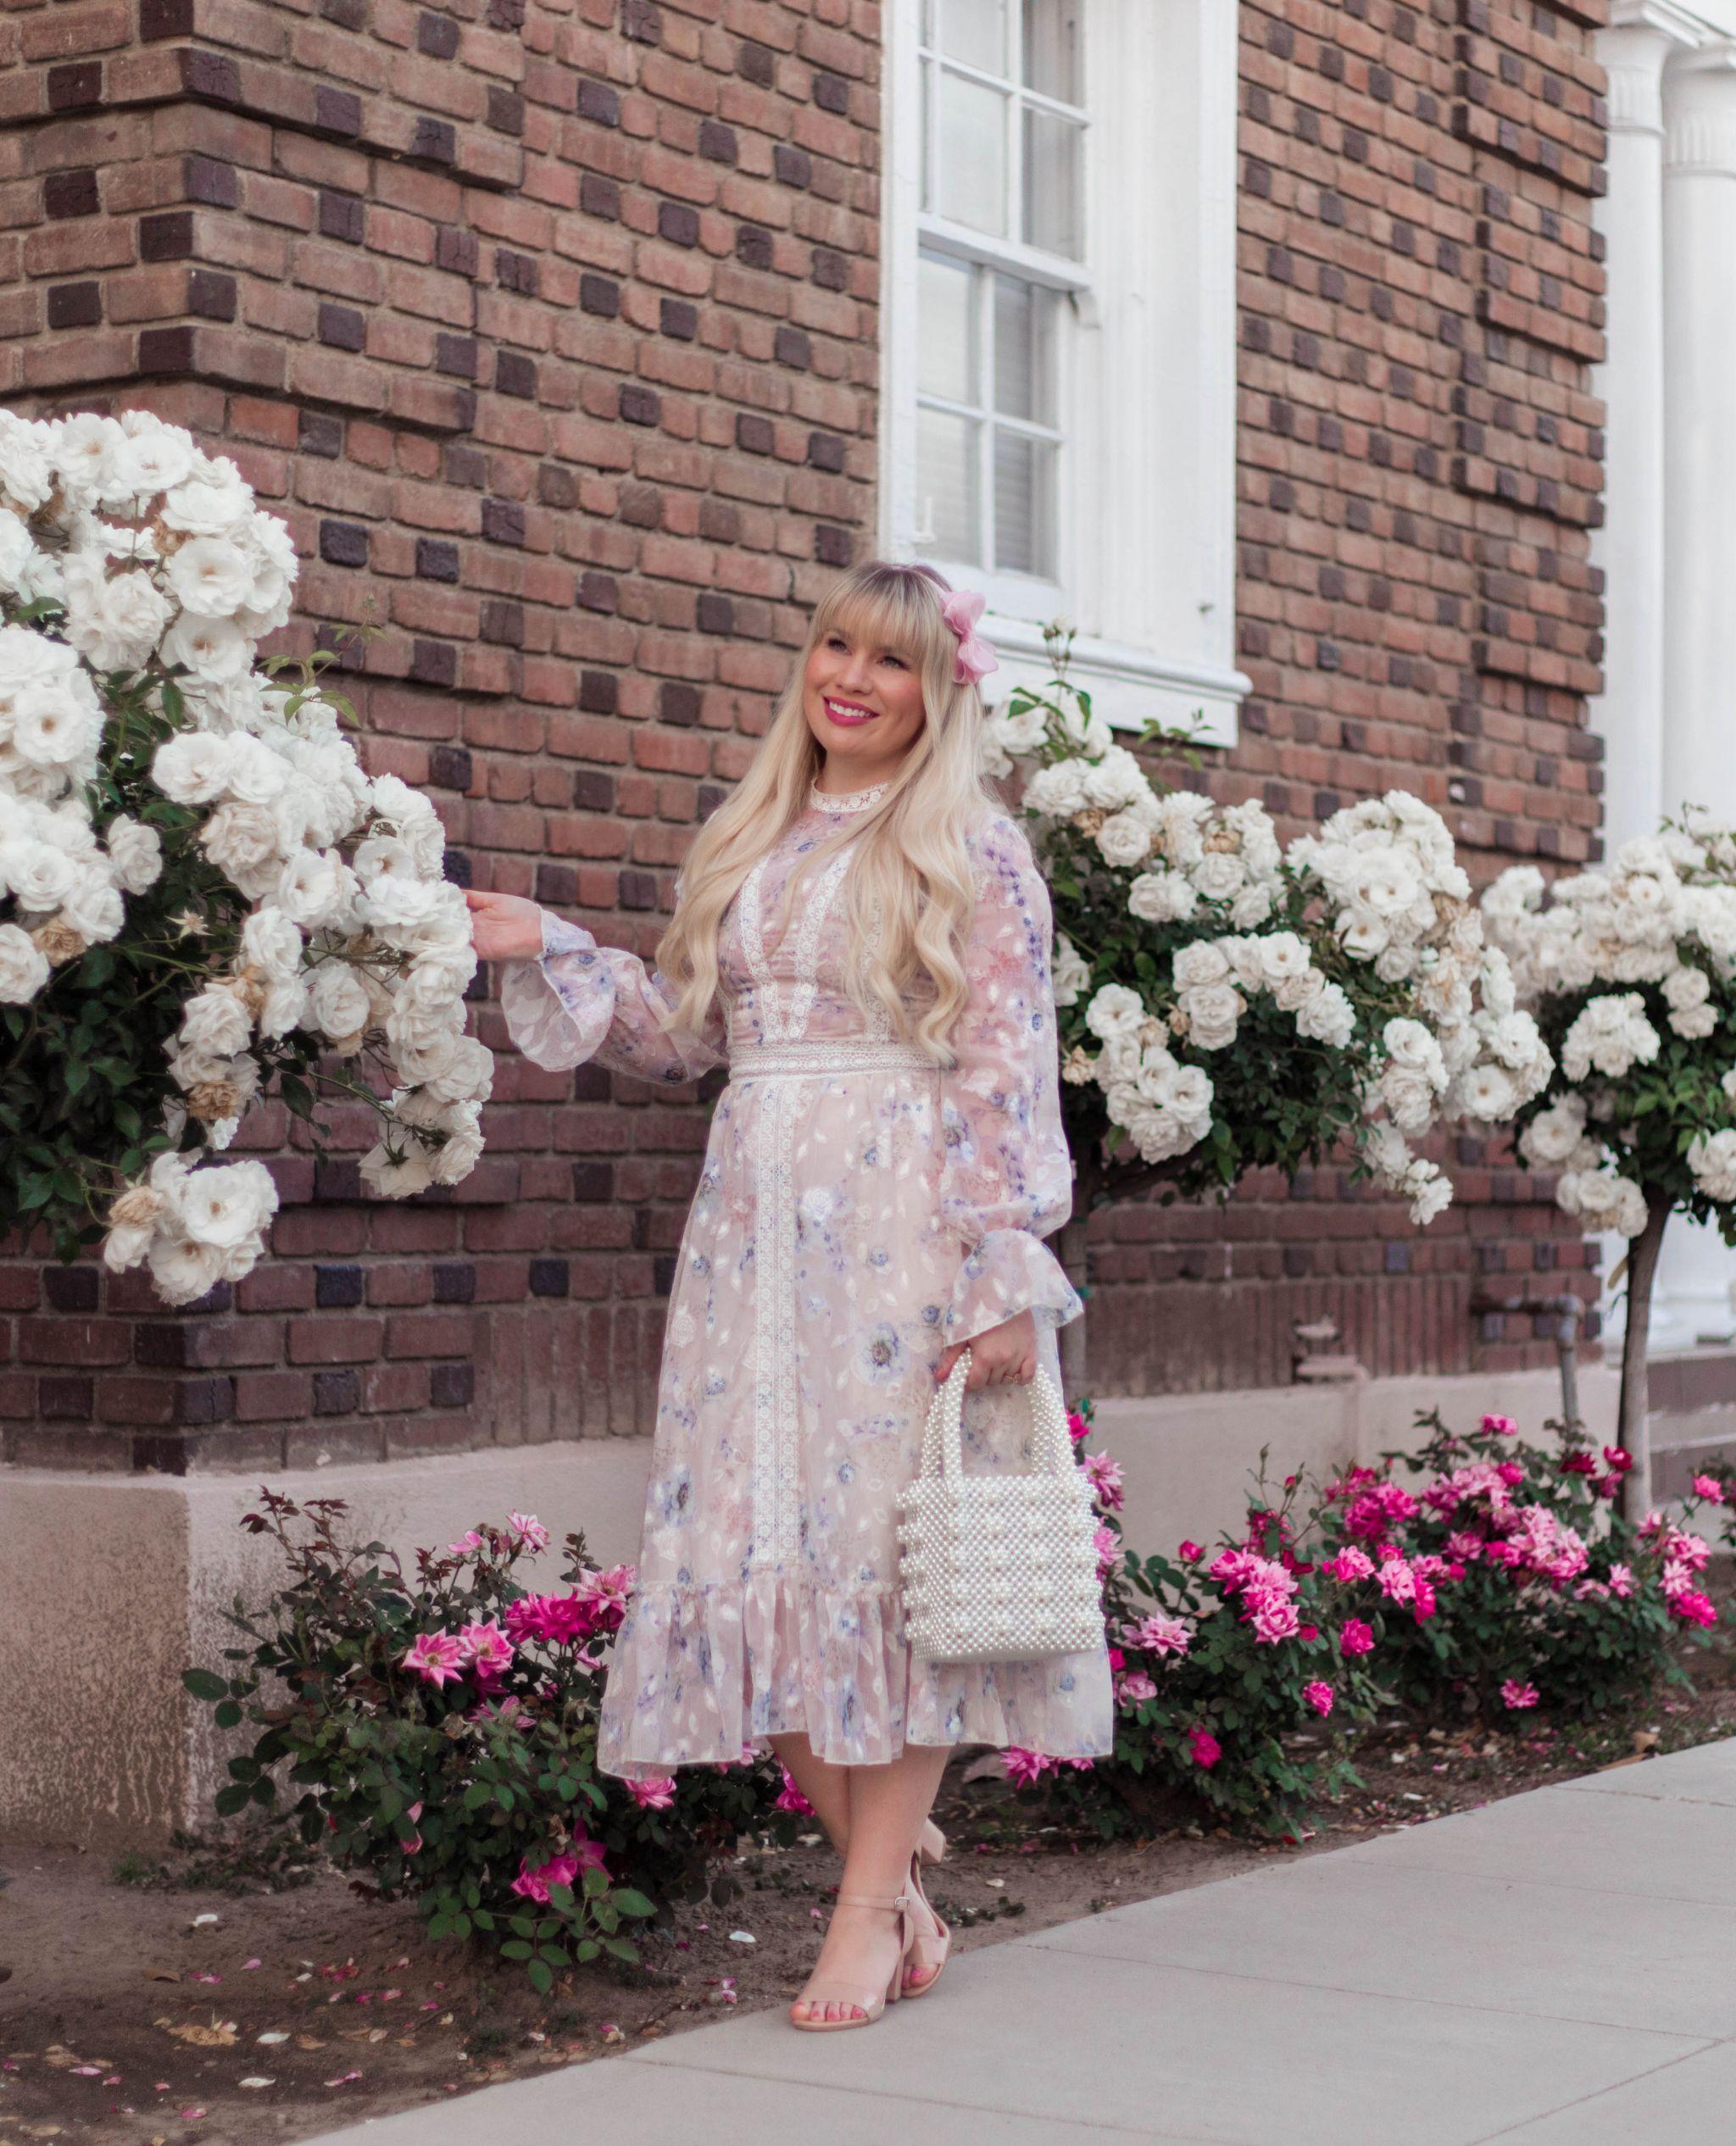 feminine spring outfit idea